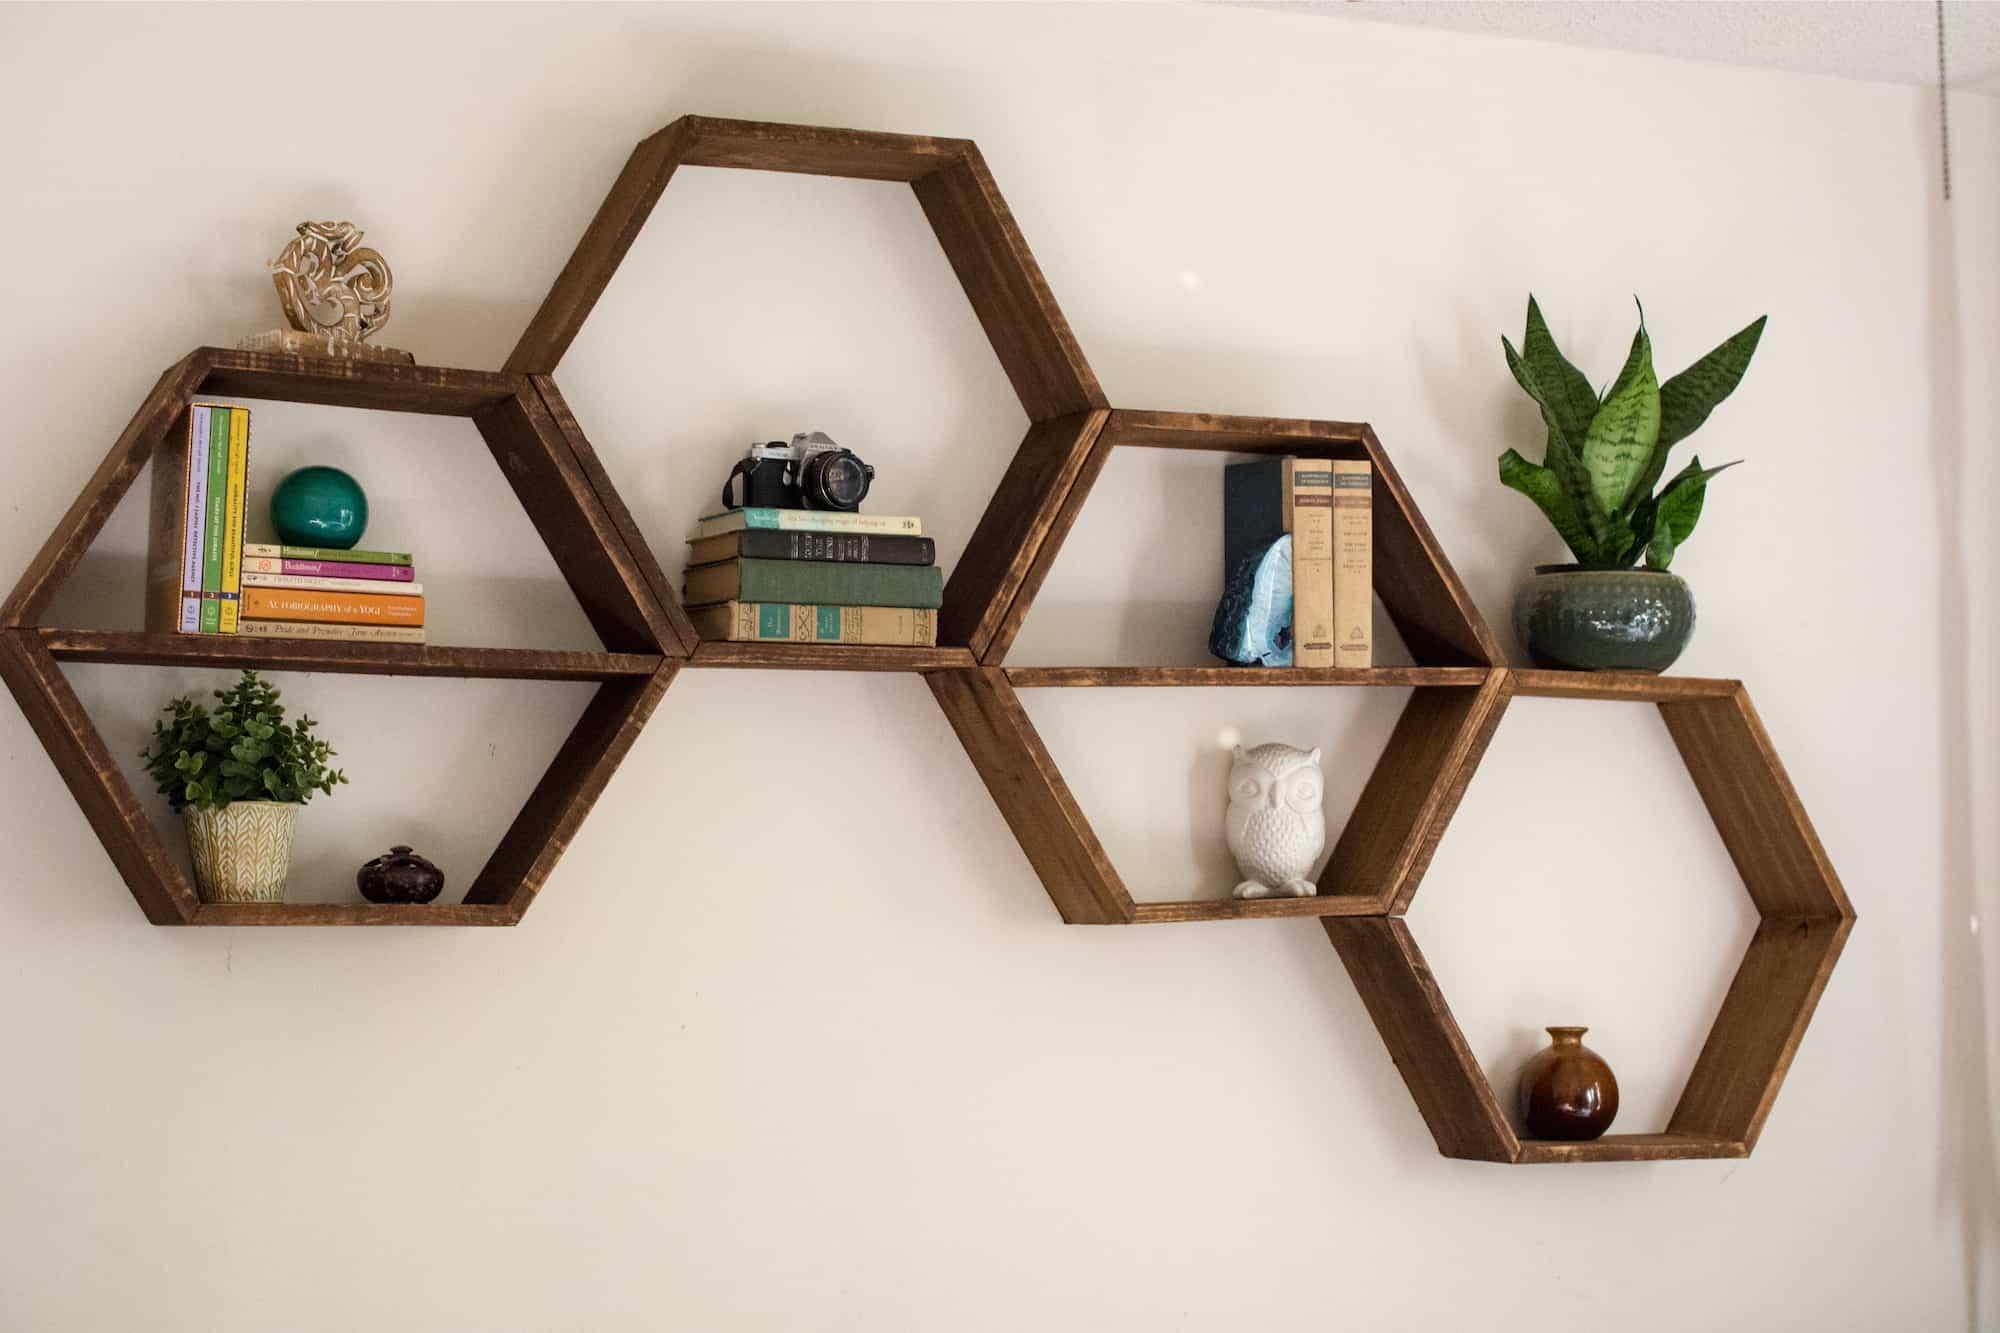 DIY wooden honeycomb shelves